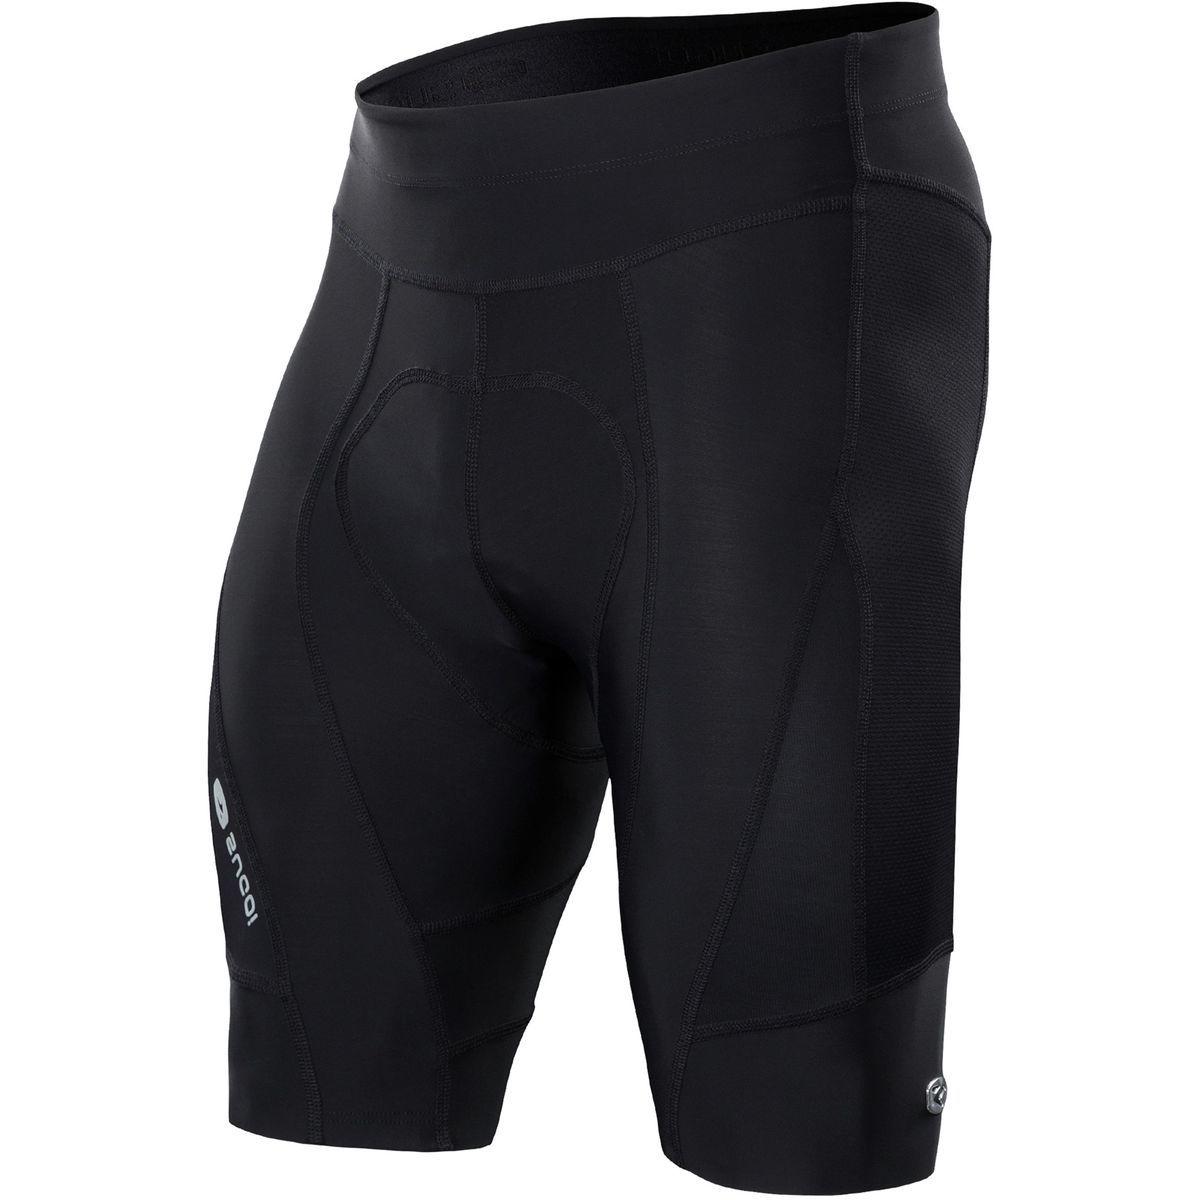 SUGOi RS Pro Short - Men's